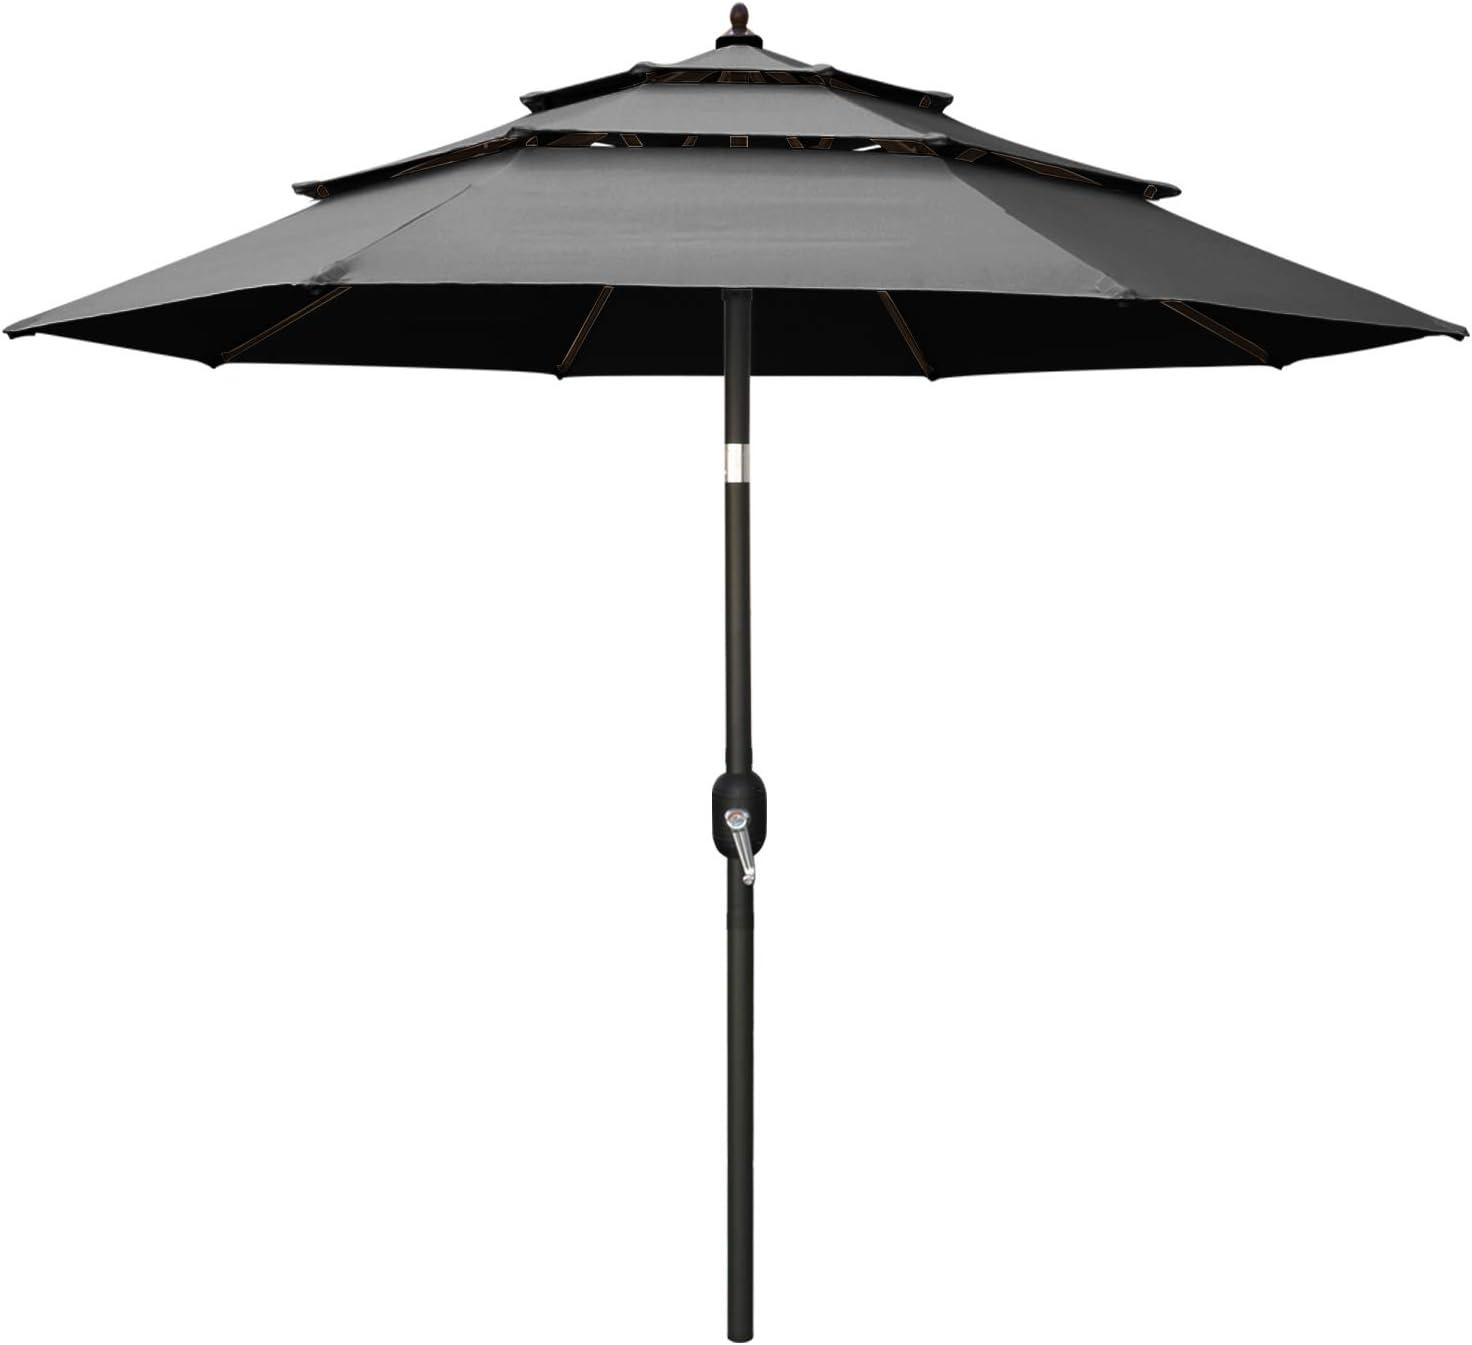 ABCCANOPY 9FT 3 Tiers Market Umbrella Patio Umbrella Outdoor Table Umbrella with Ventilation and Push Button Tilt for Garden, Deck, Backyard and Pool,8 Ribs Gray